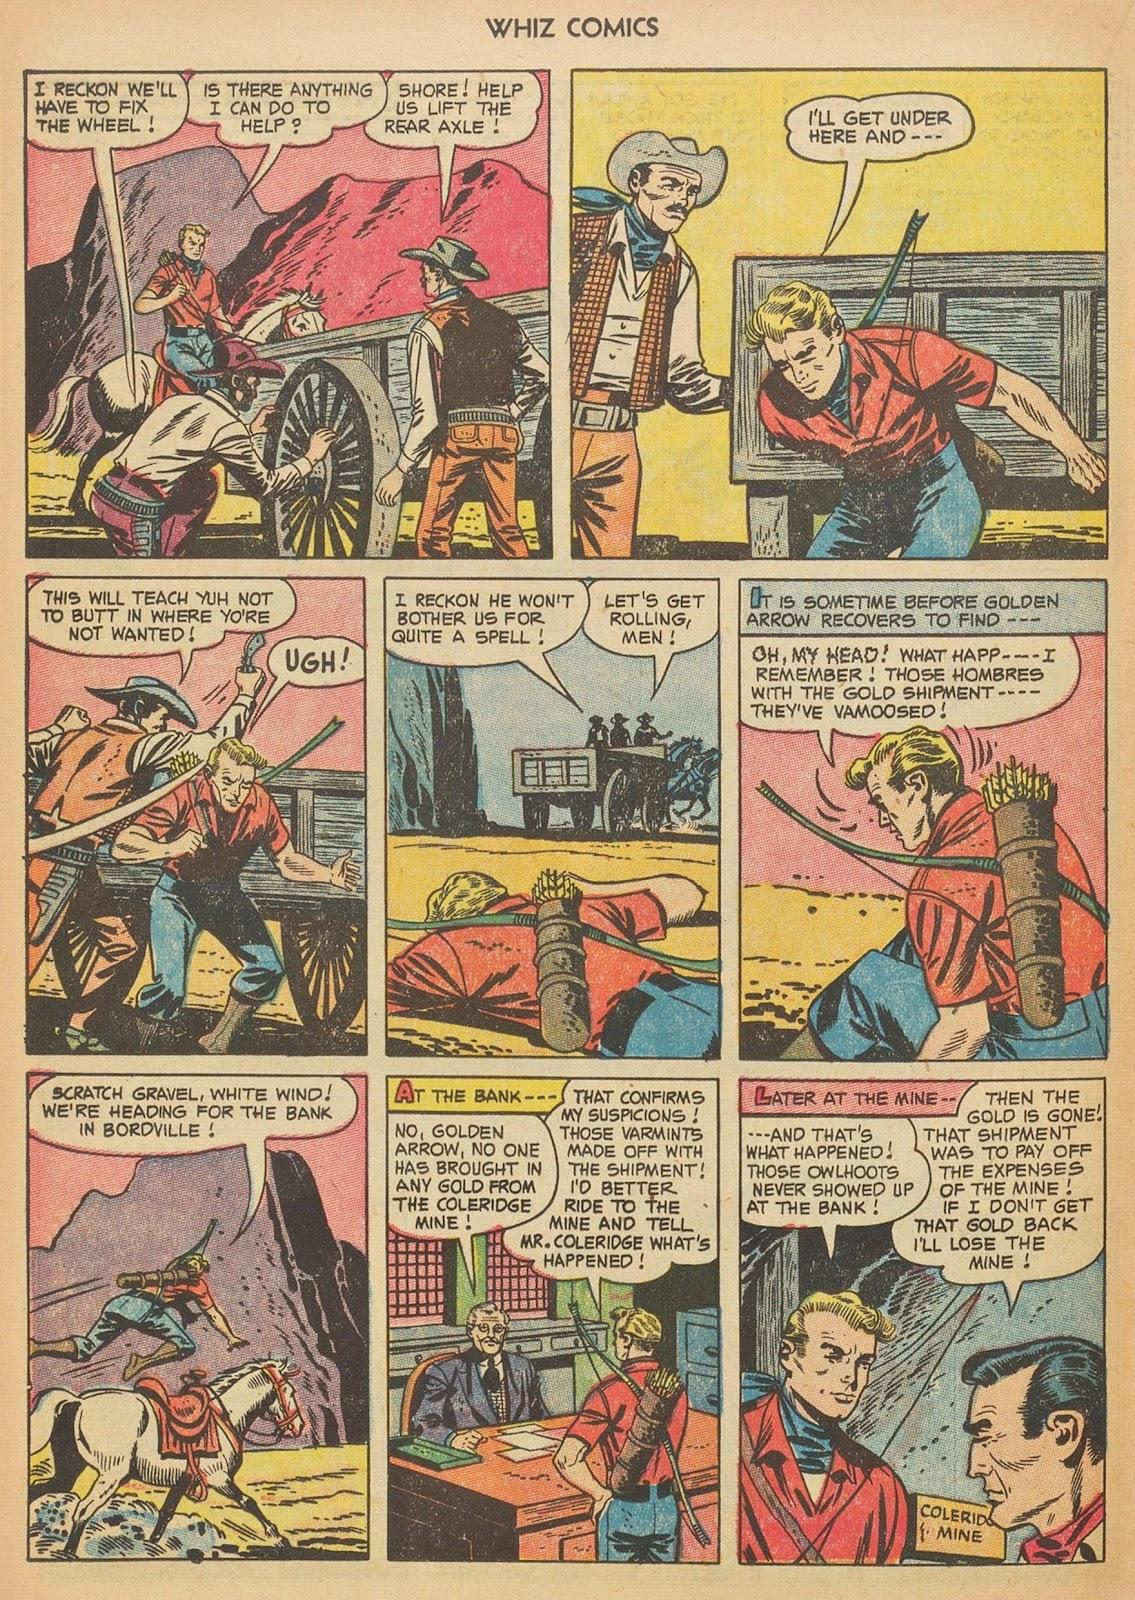 Read online WHIZ Comics comic -  Issue #153 - 20